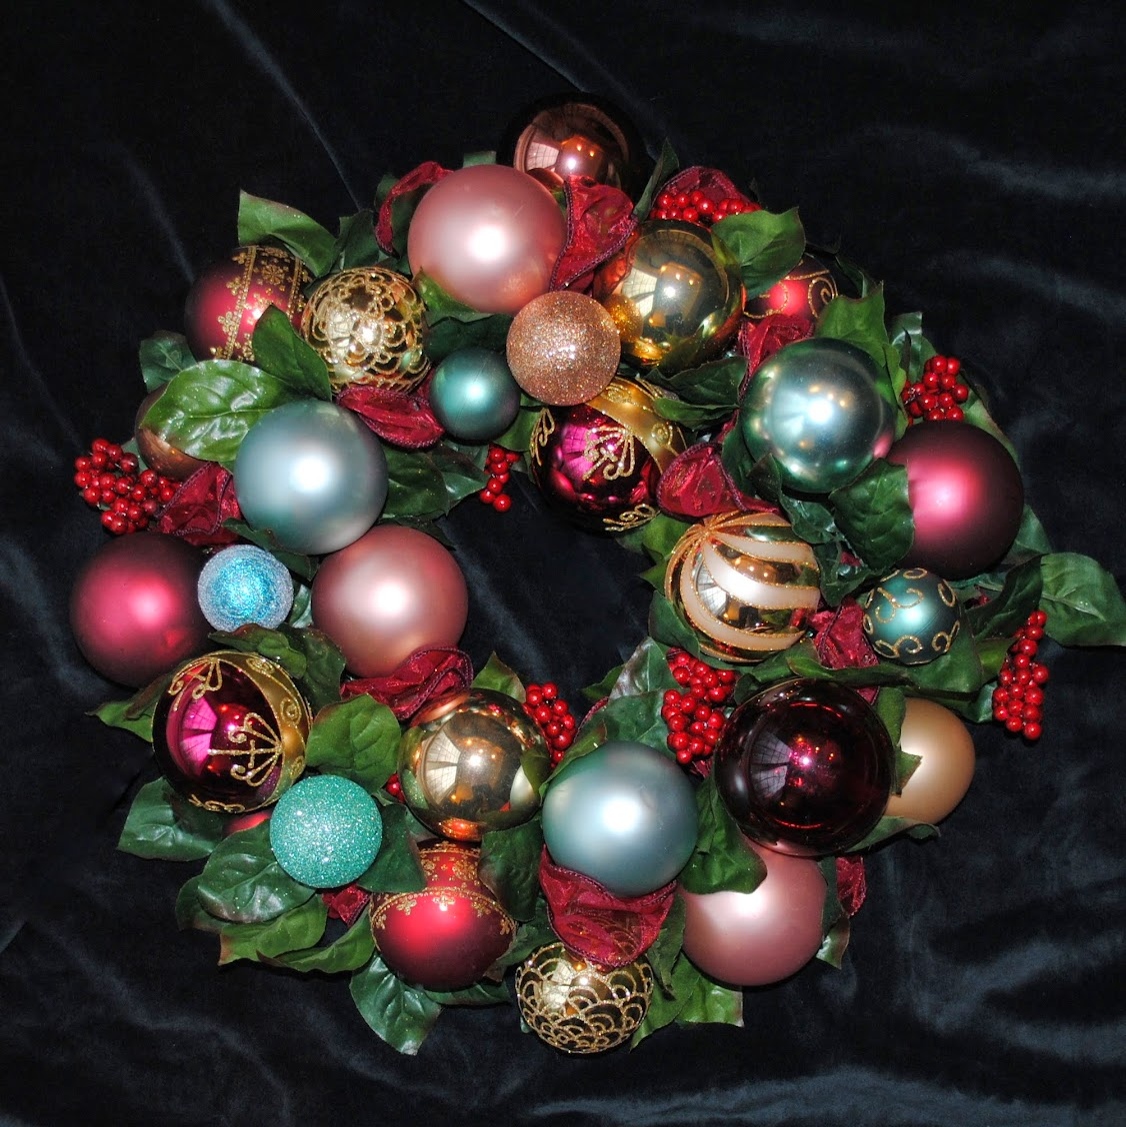 Joy Christmas Ornament Wreath Centerpiece OWR8035